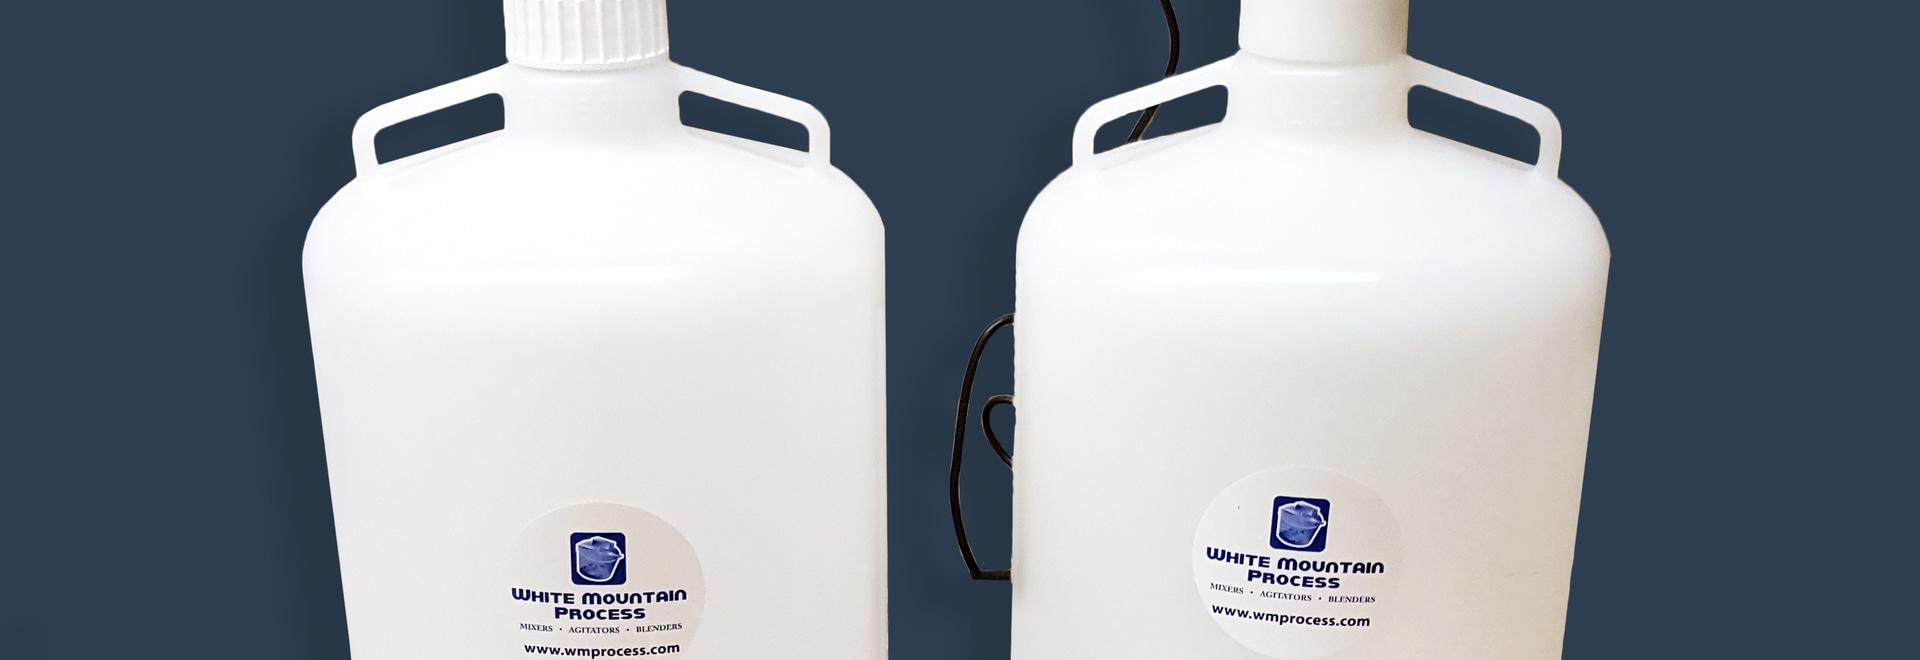 New Sanitary Mixtank System